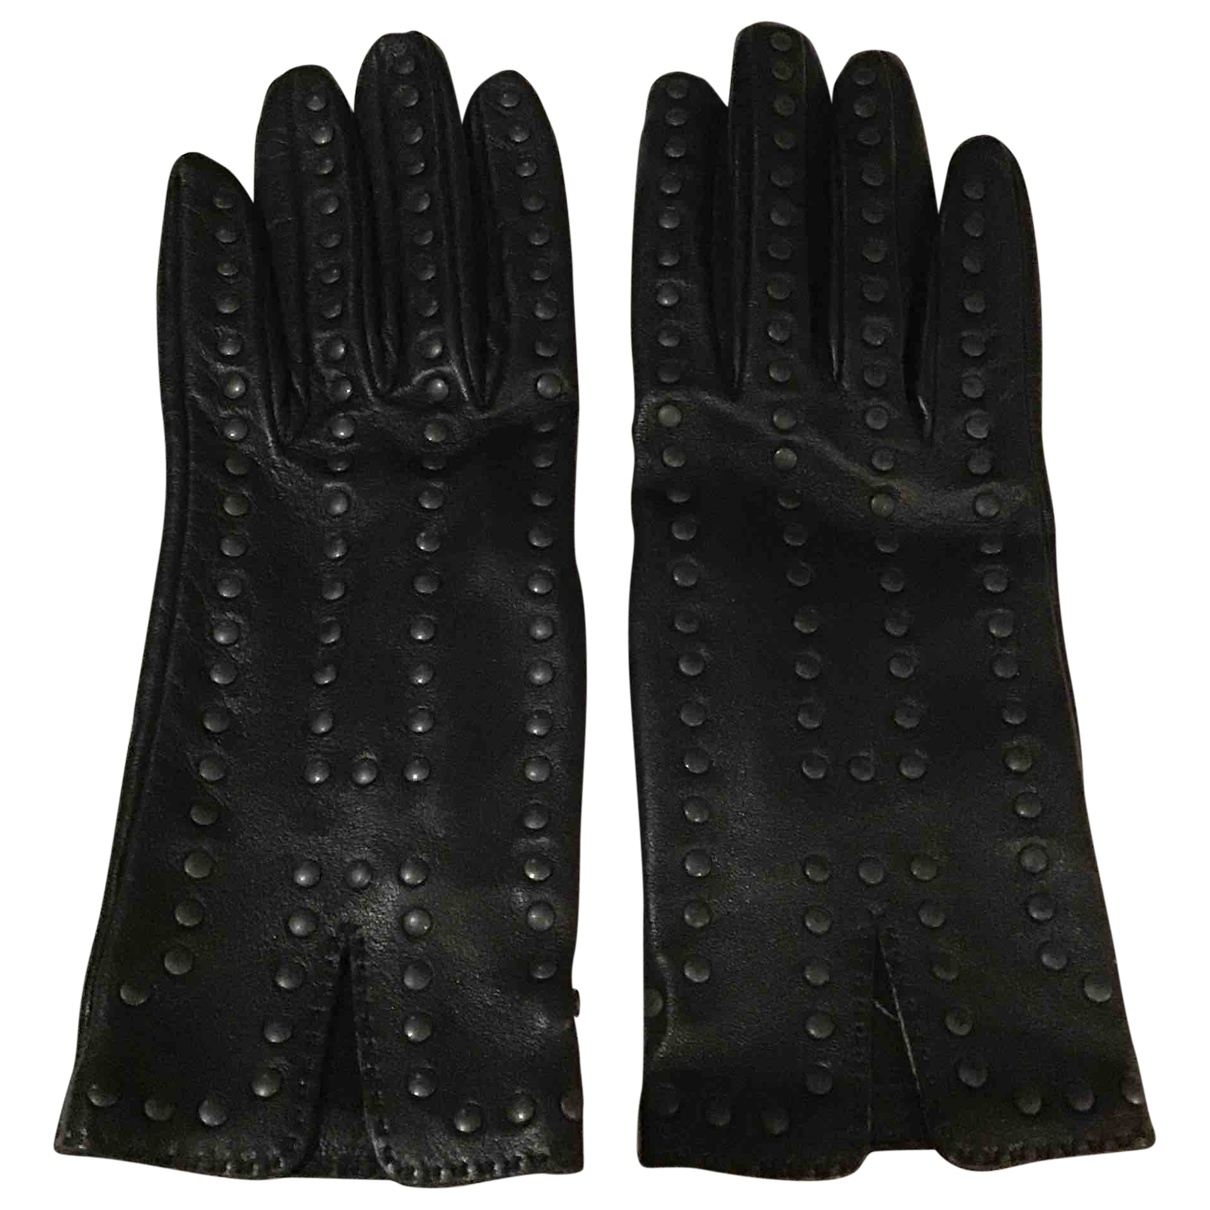 Hermès \N Black Leather Gloves for Women S International